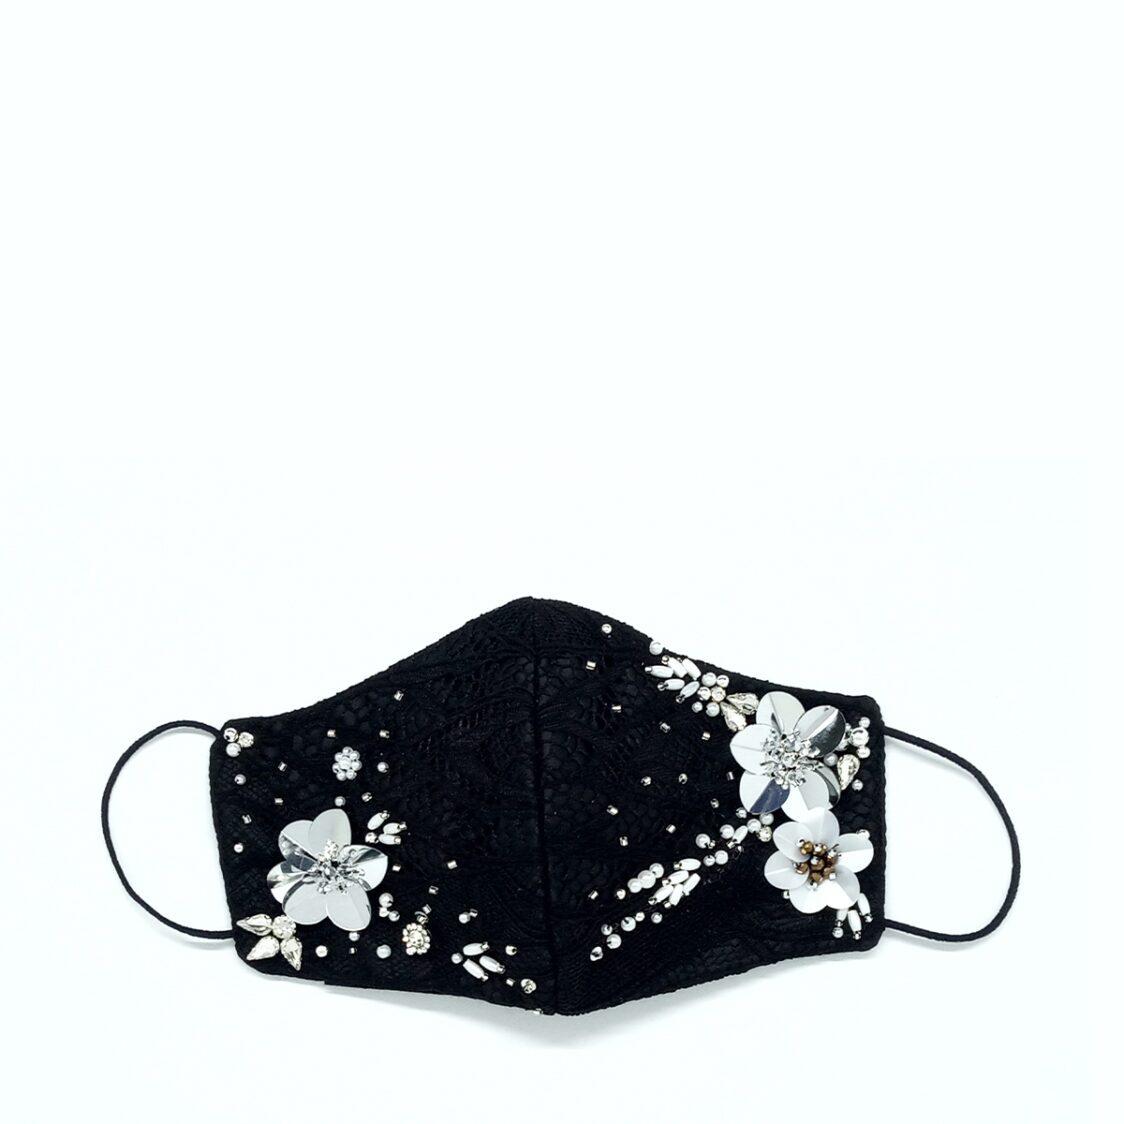 Gayatri Mask - Lace Beads Black